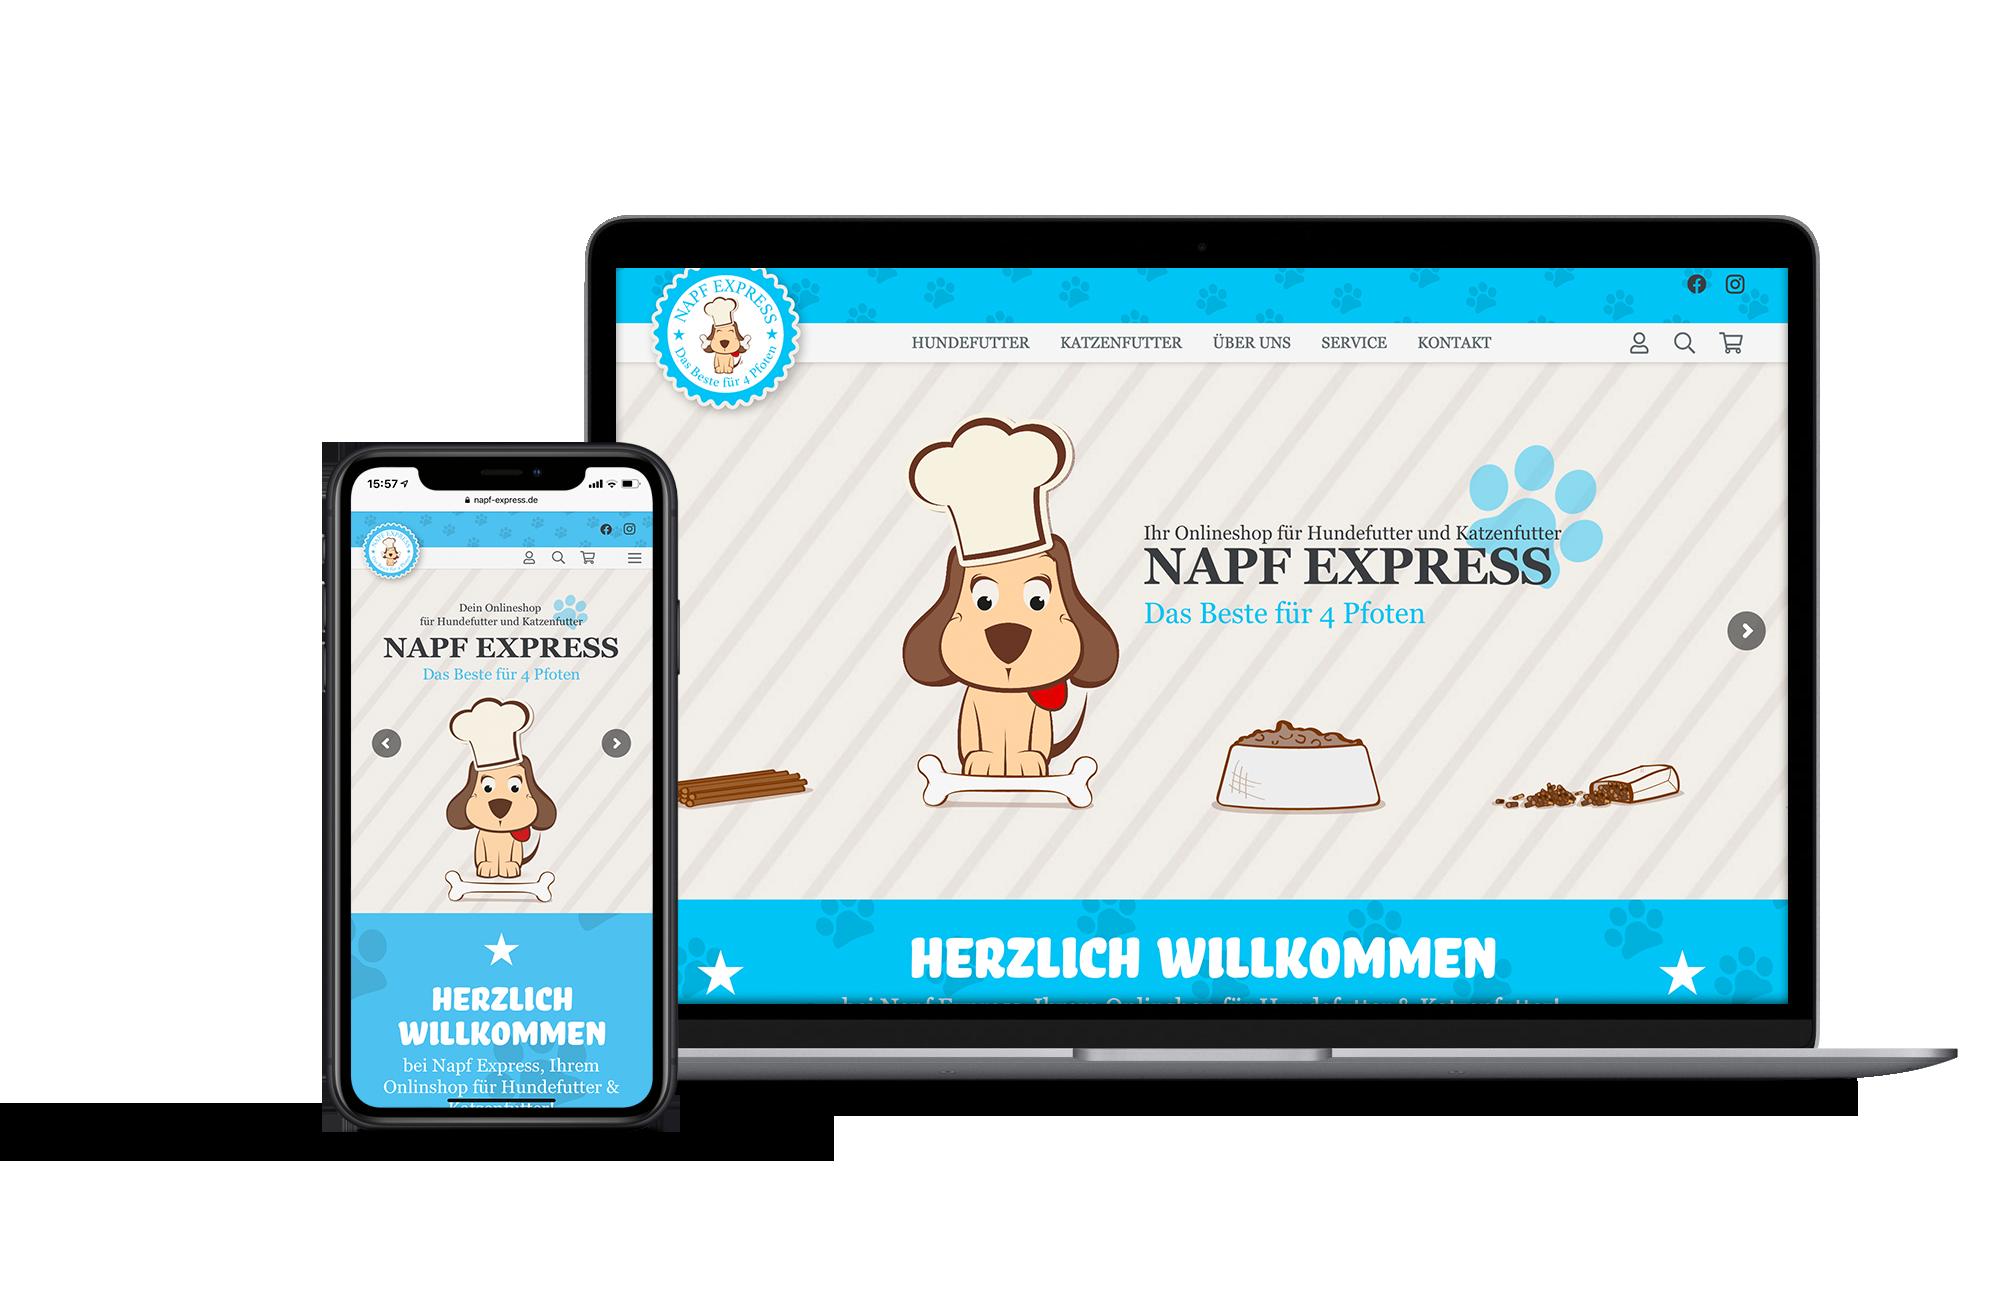 Webdesign Paderborn •Design 7 • Werbeagentur Paderborn • Webshop • SEO Optimierung • Suchmaschinenoptimierung Paderborn • SEO-Agentur Paderborn